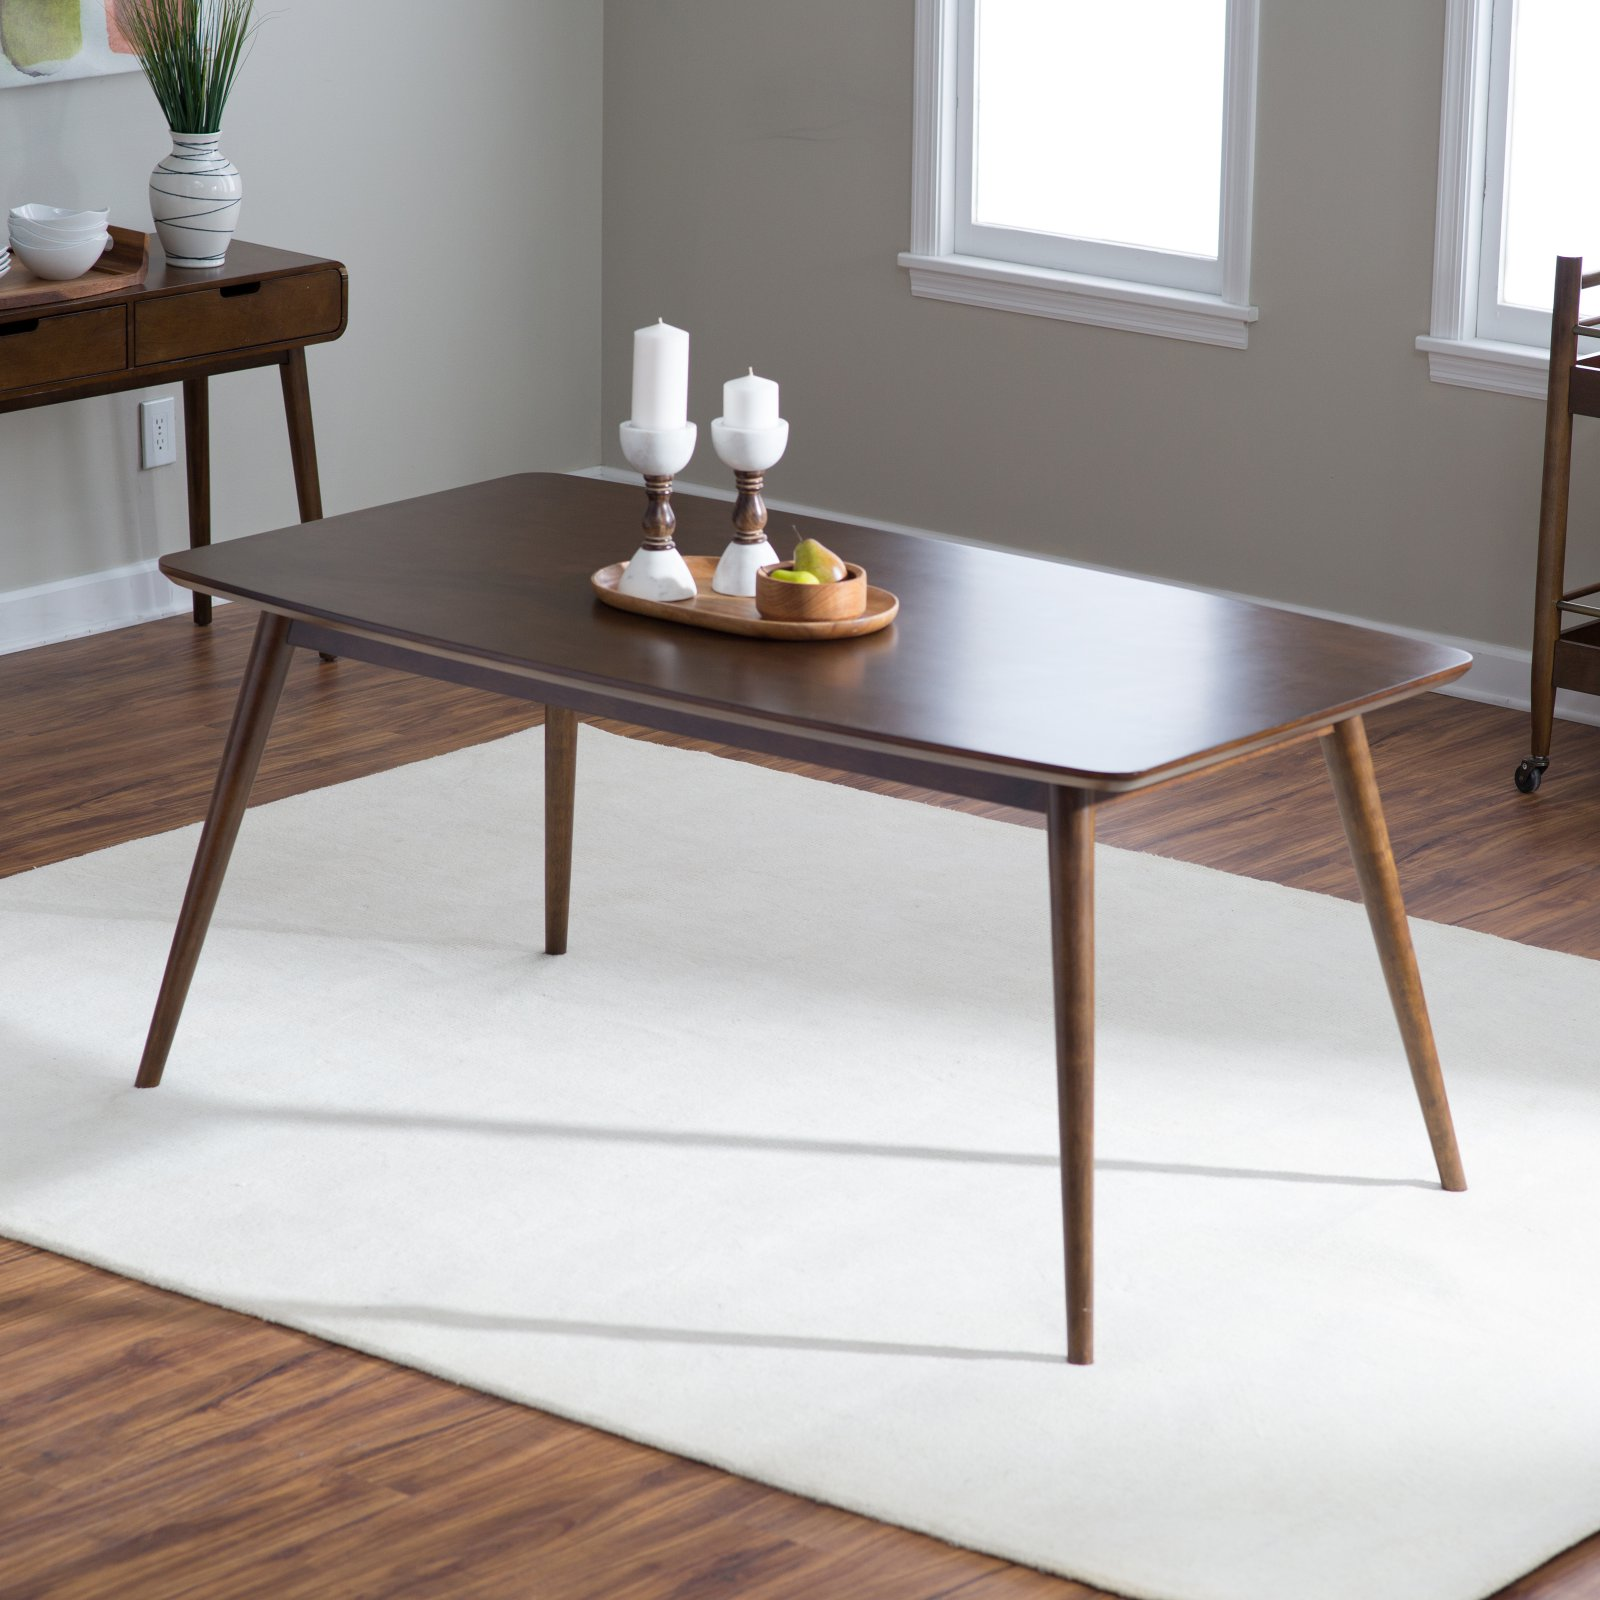 Belham Living Carter Mid-Century Modern Dining Table - Walmart.com